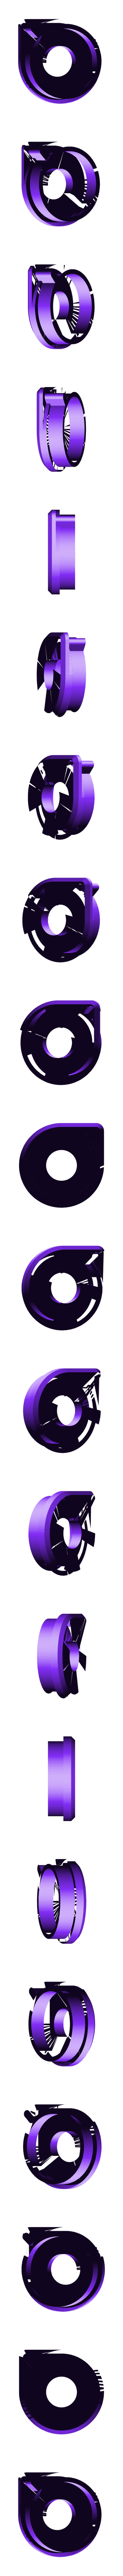 Penny Roll Lid.stl Download free STL file Coin Rolls • Design to 3D print, Hom3d